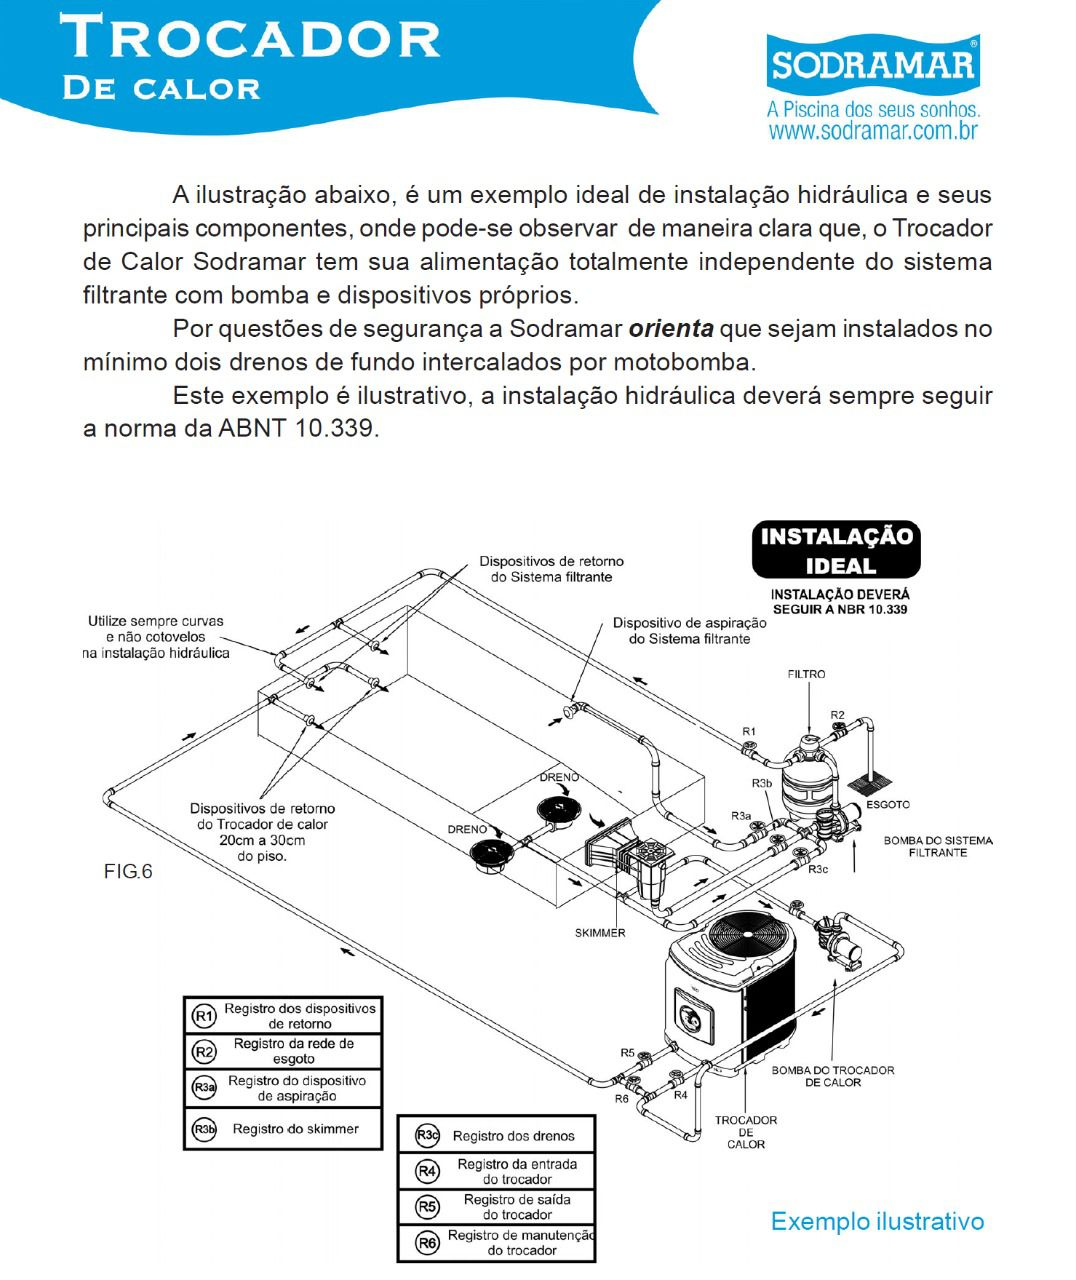 Aquecedor de piscina Yes - Trocador de Calor SD-60 Trif 220V